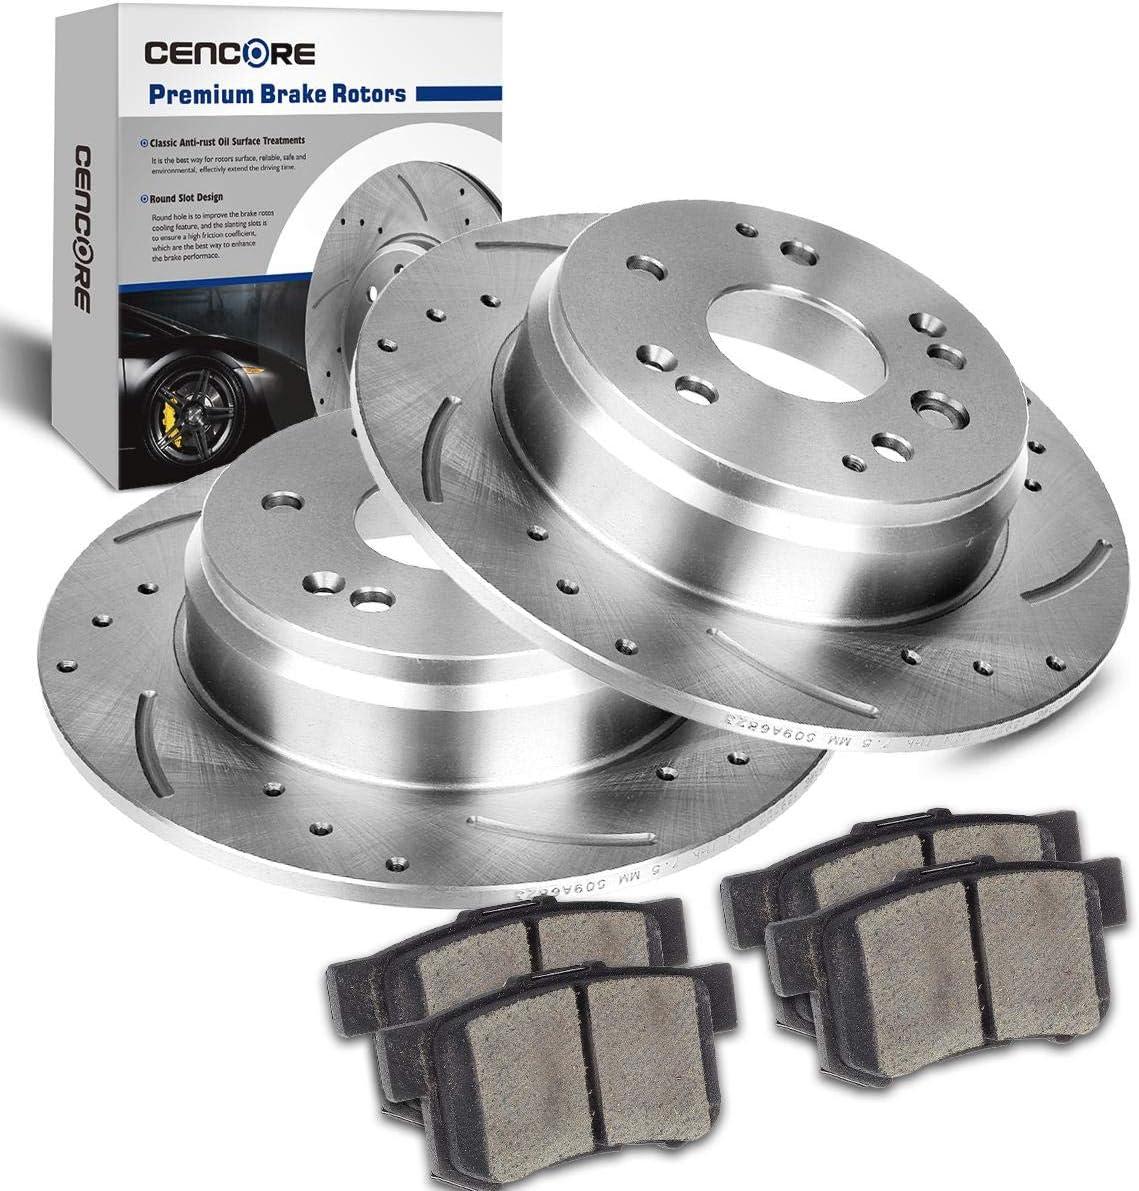 For 2003-2011 Acura,Honda TL,Element Rear Calipers+Drill Slot Brake Rotors+Pads